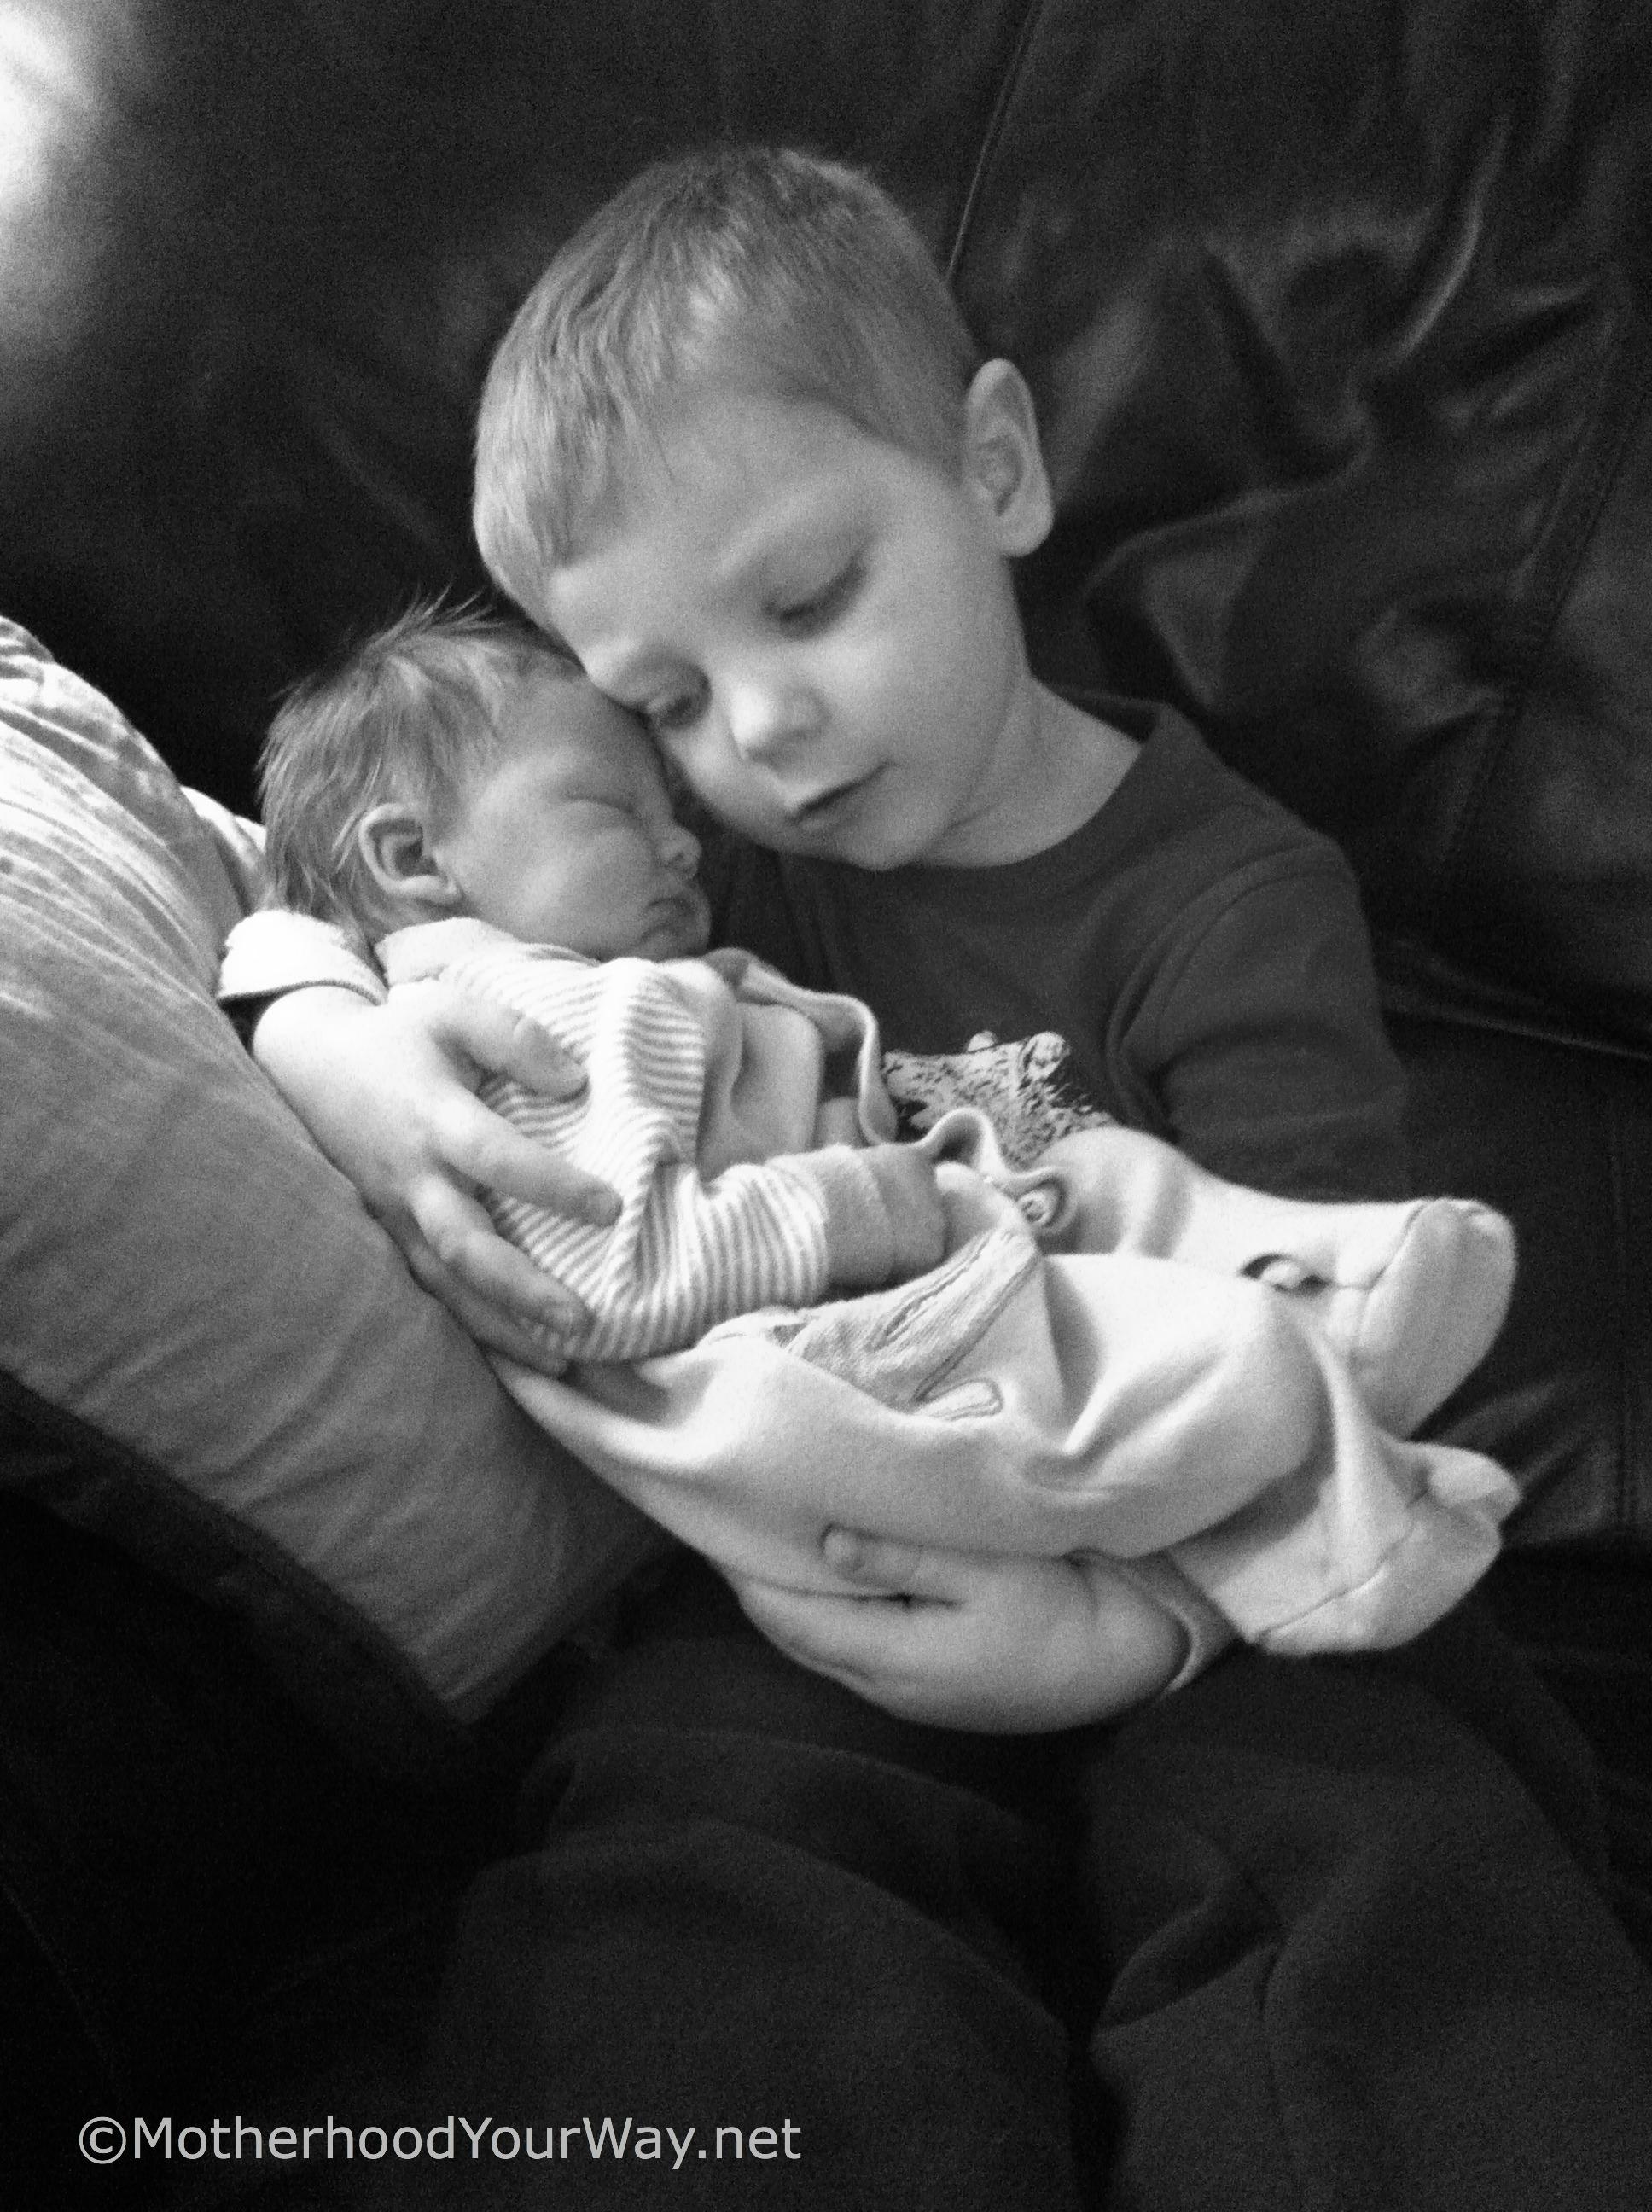 Wordless Wednesday- Brotherly Love